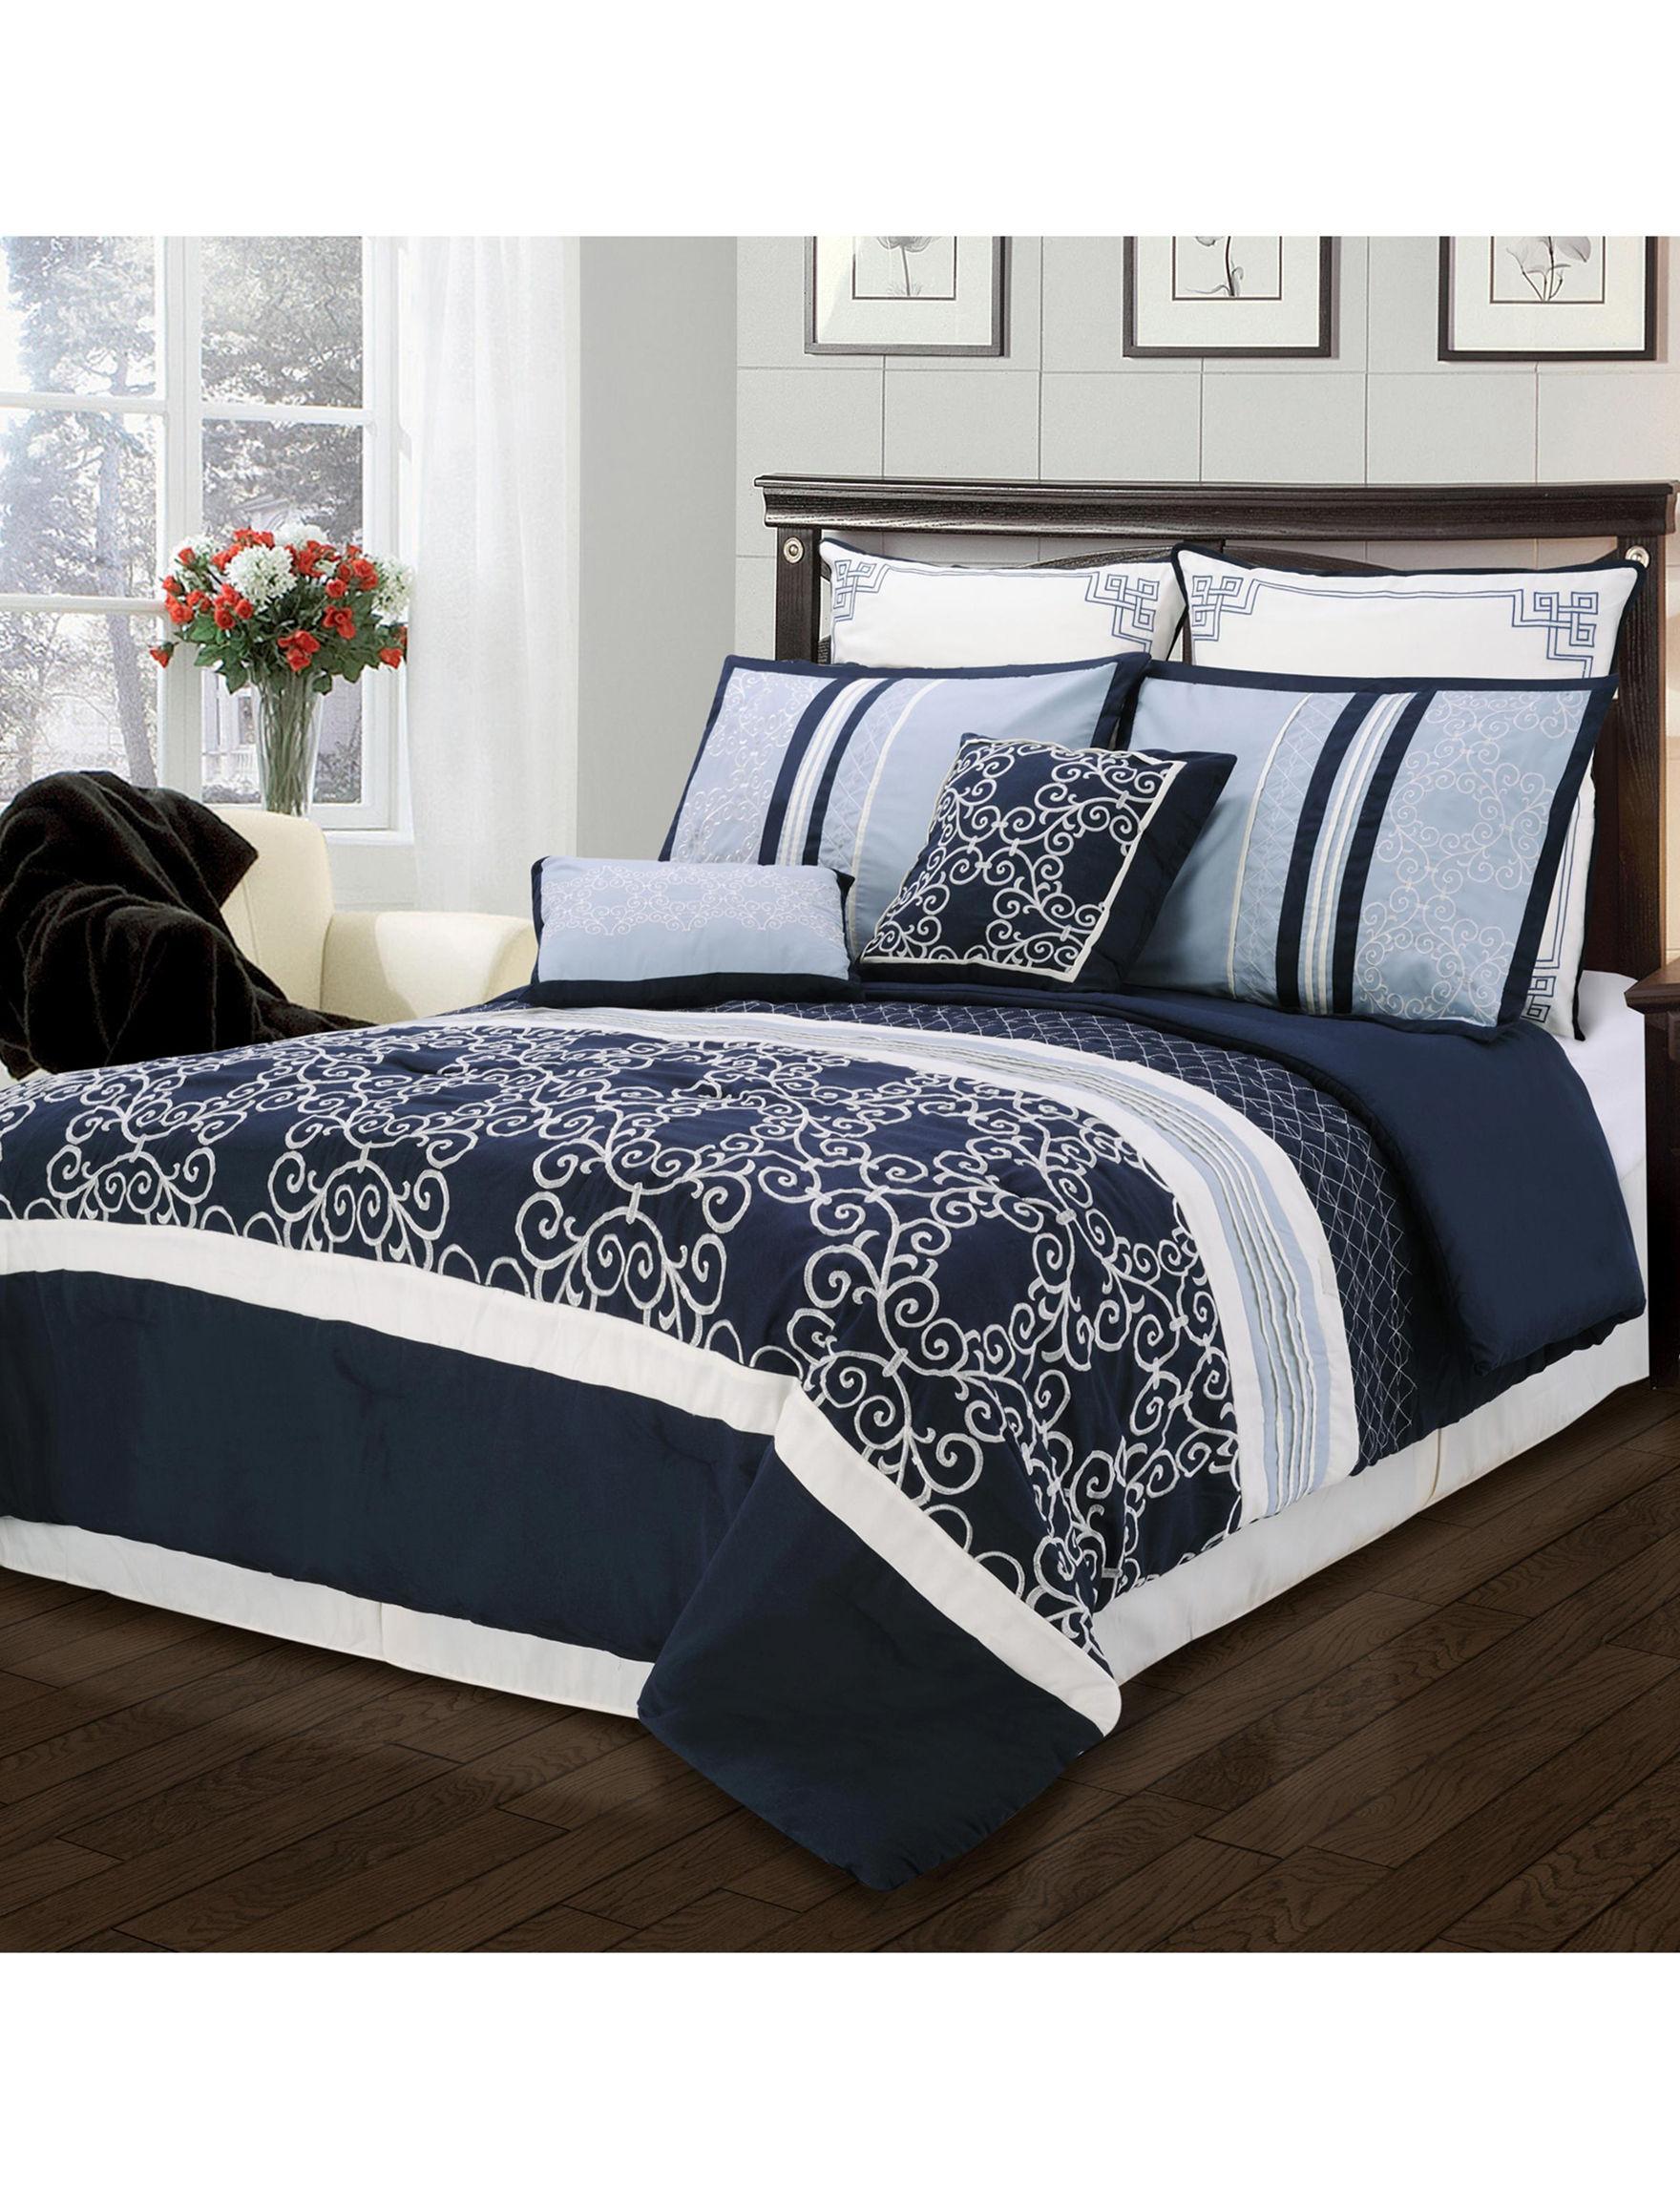 Superior Blue Sheets & Pillowcases